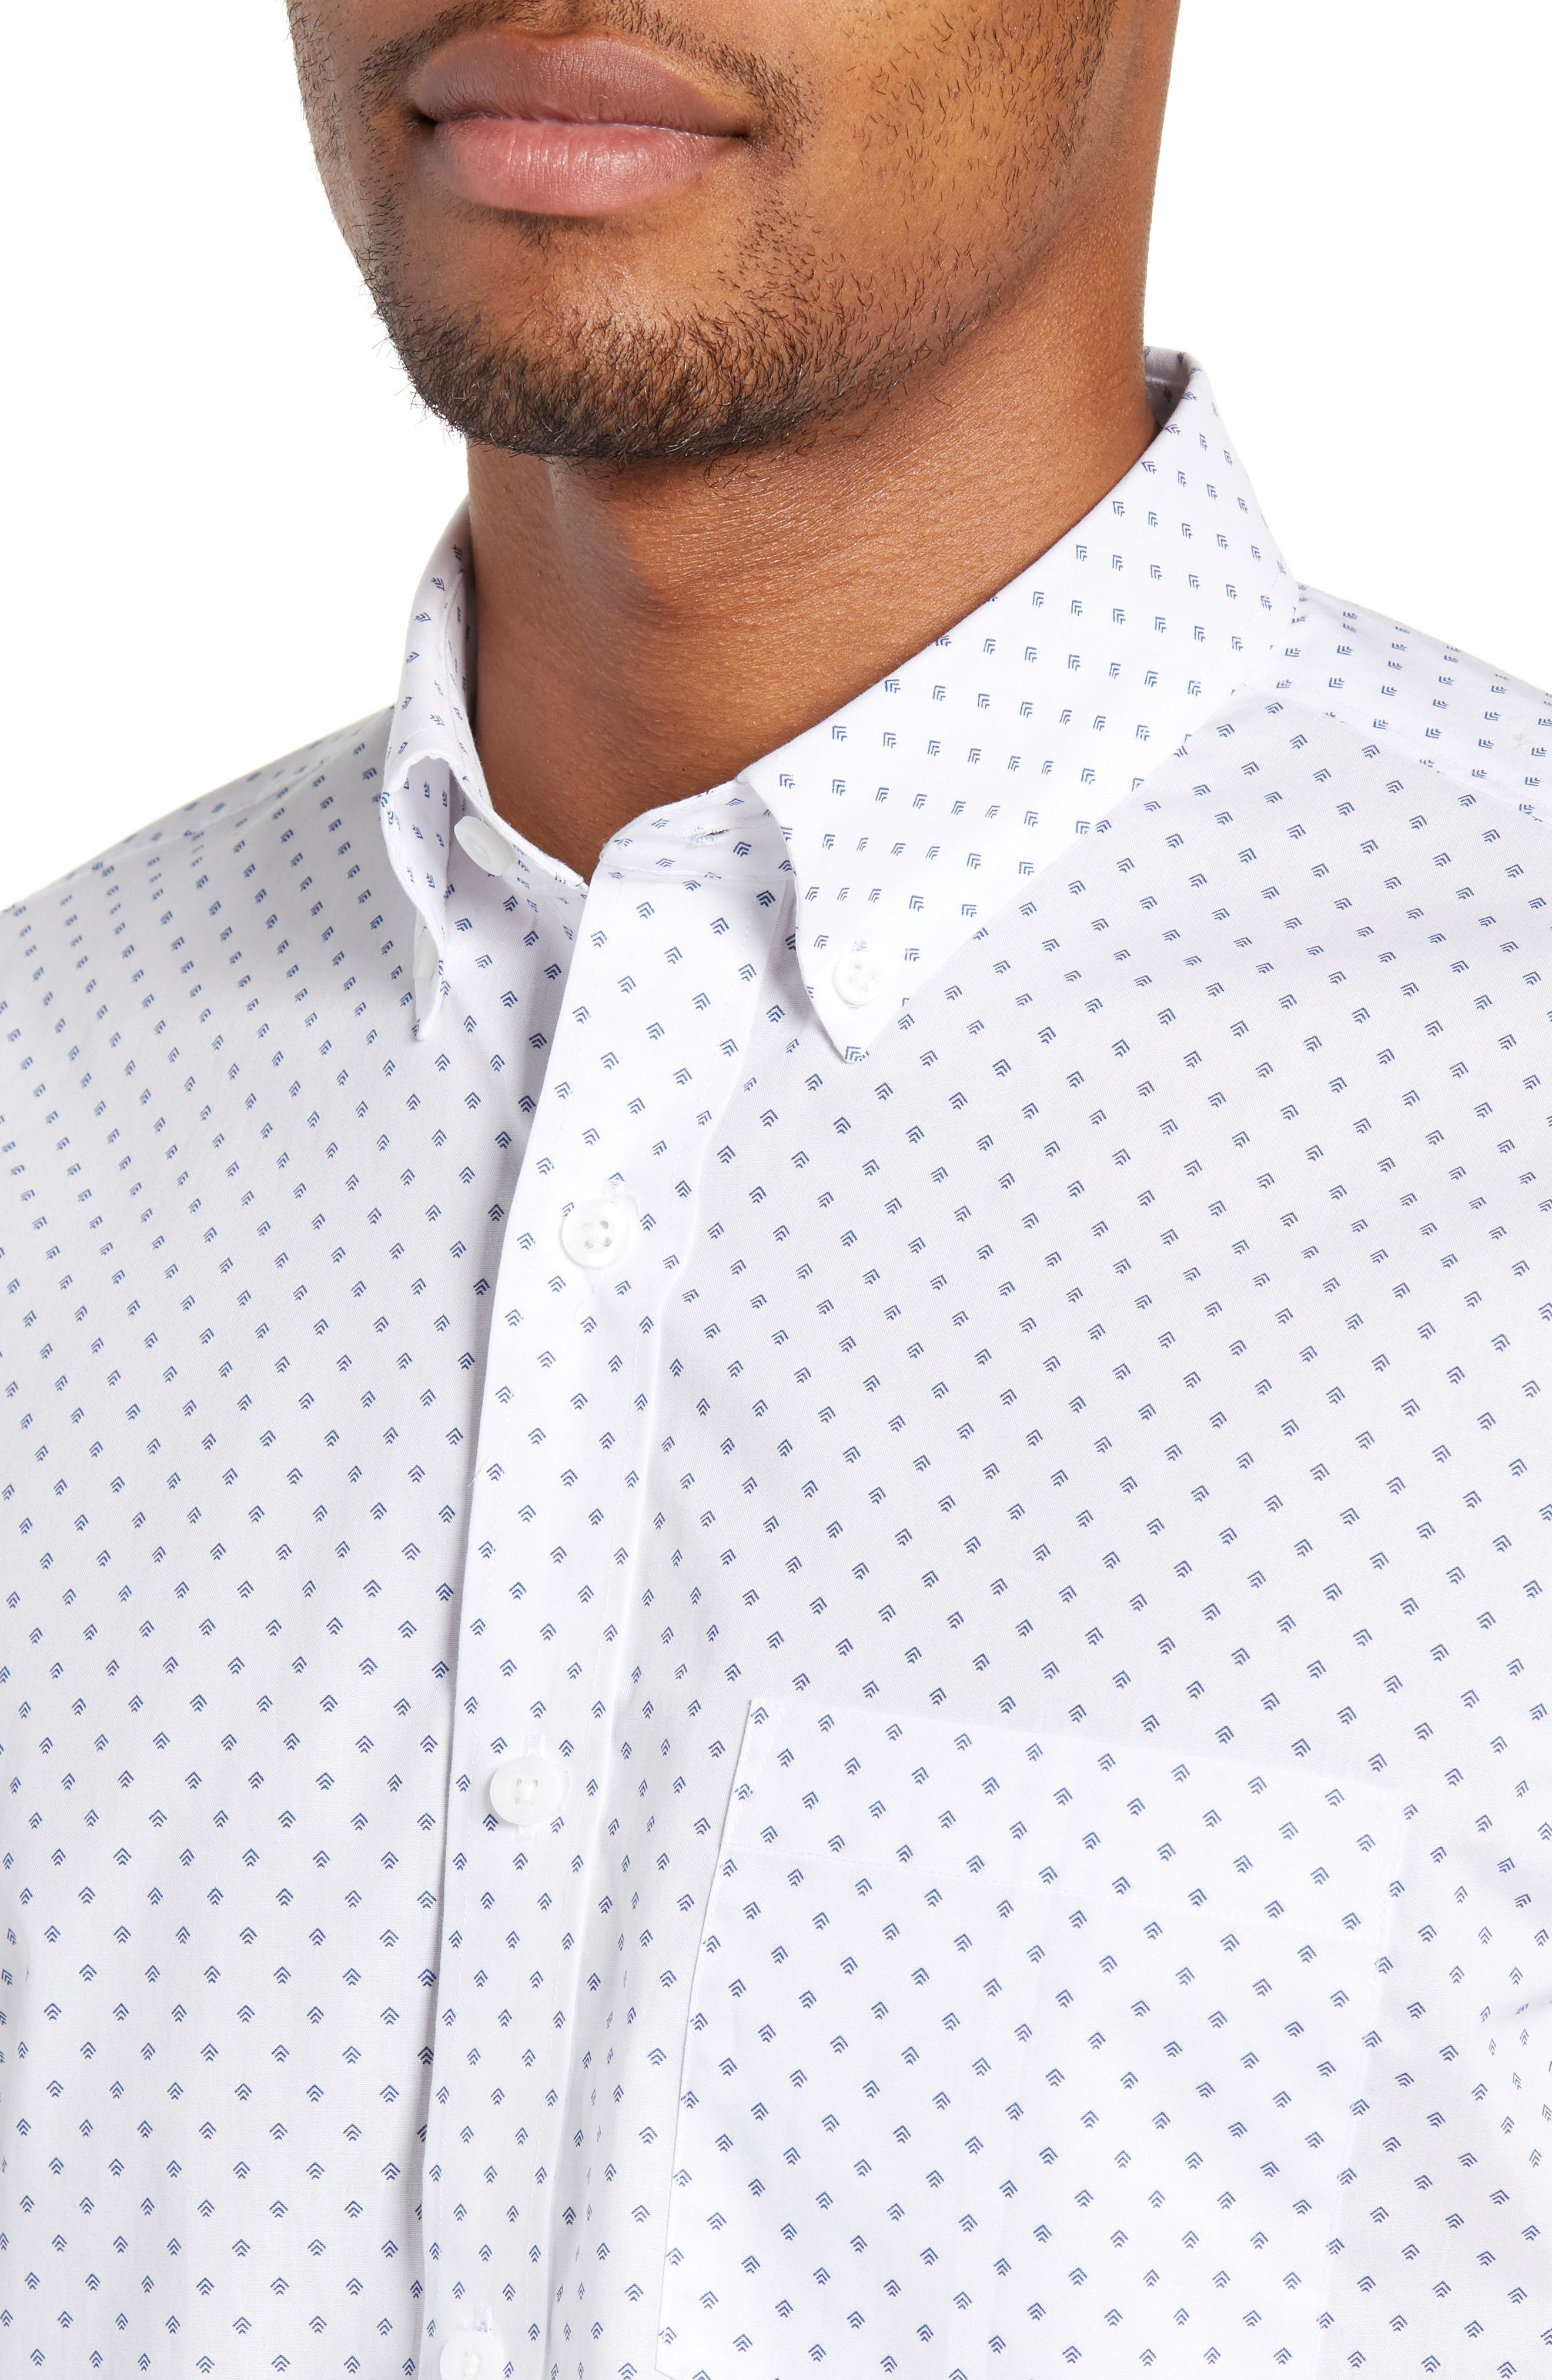 NORDSTROM MEN'S SHOP,                             Slim Fit Non-Iron Geo Print Sport Shirt,                             Alternate thumbnail 2, color,                             100